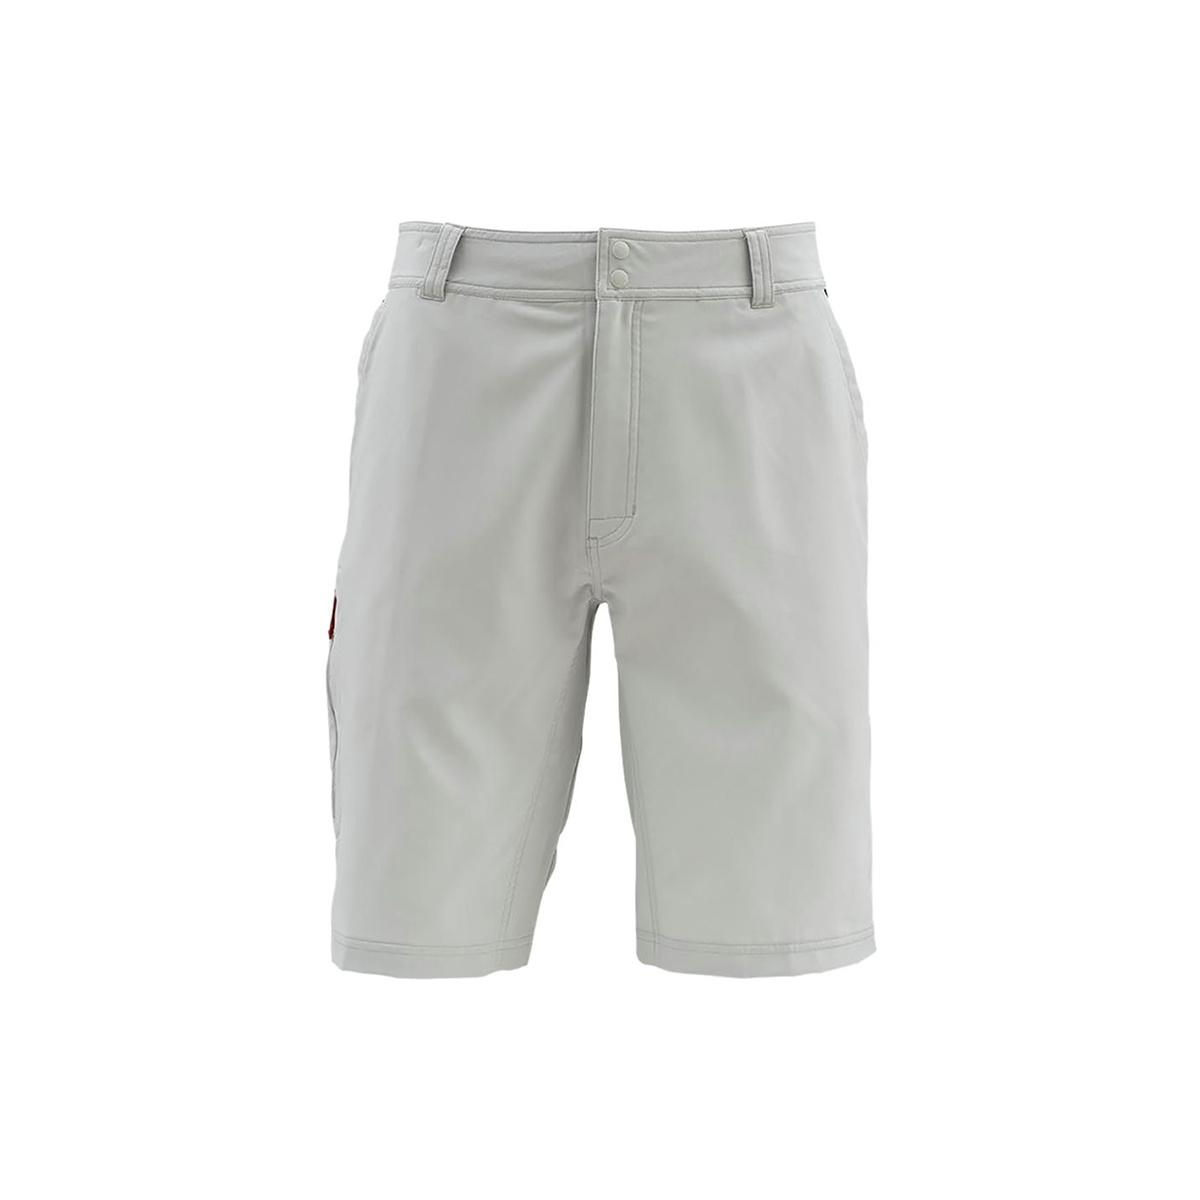 Simms Clothing Skiff Short